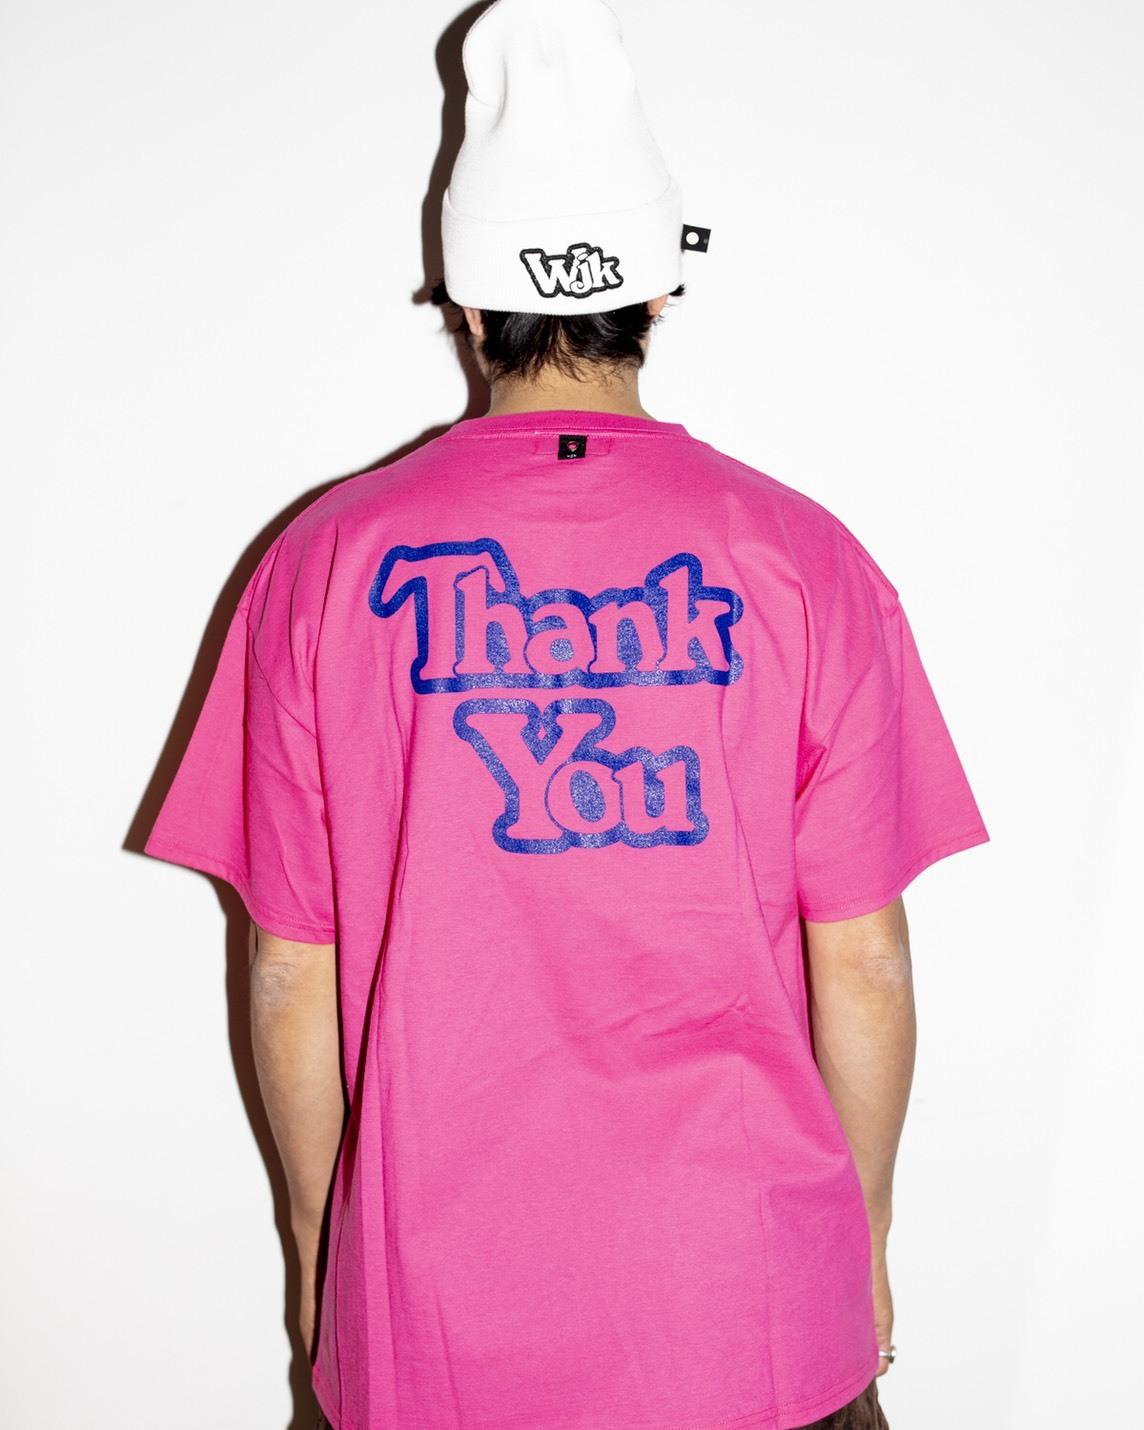 M×wjk コラボレーションTシャツ_e0036919_14120149.jpg